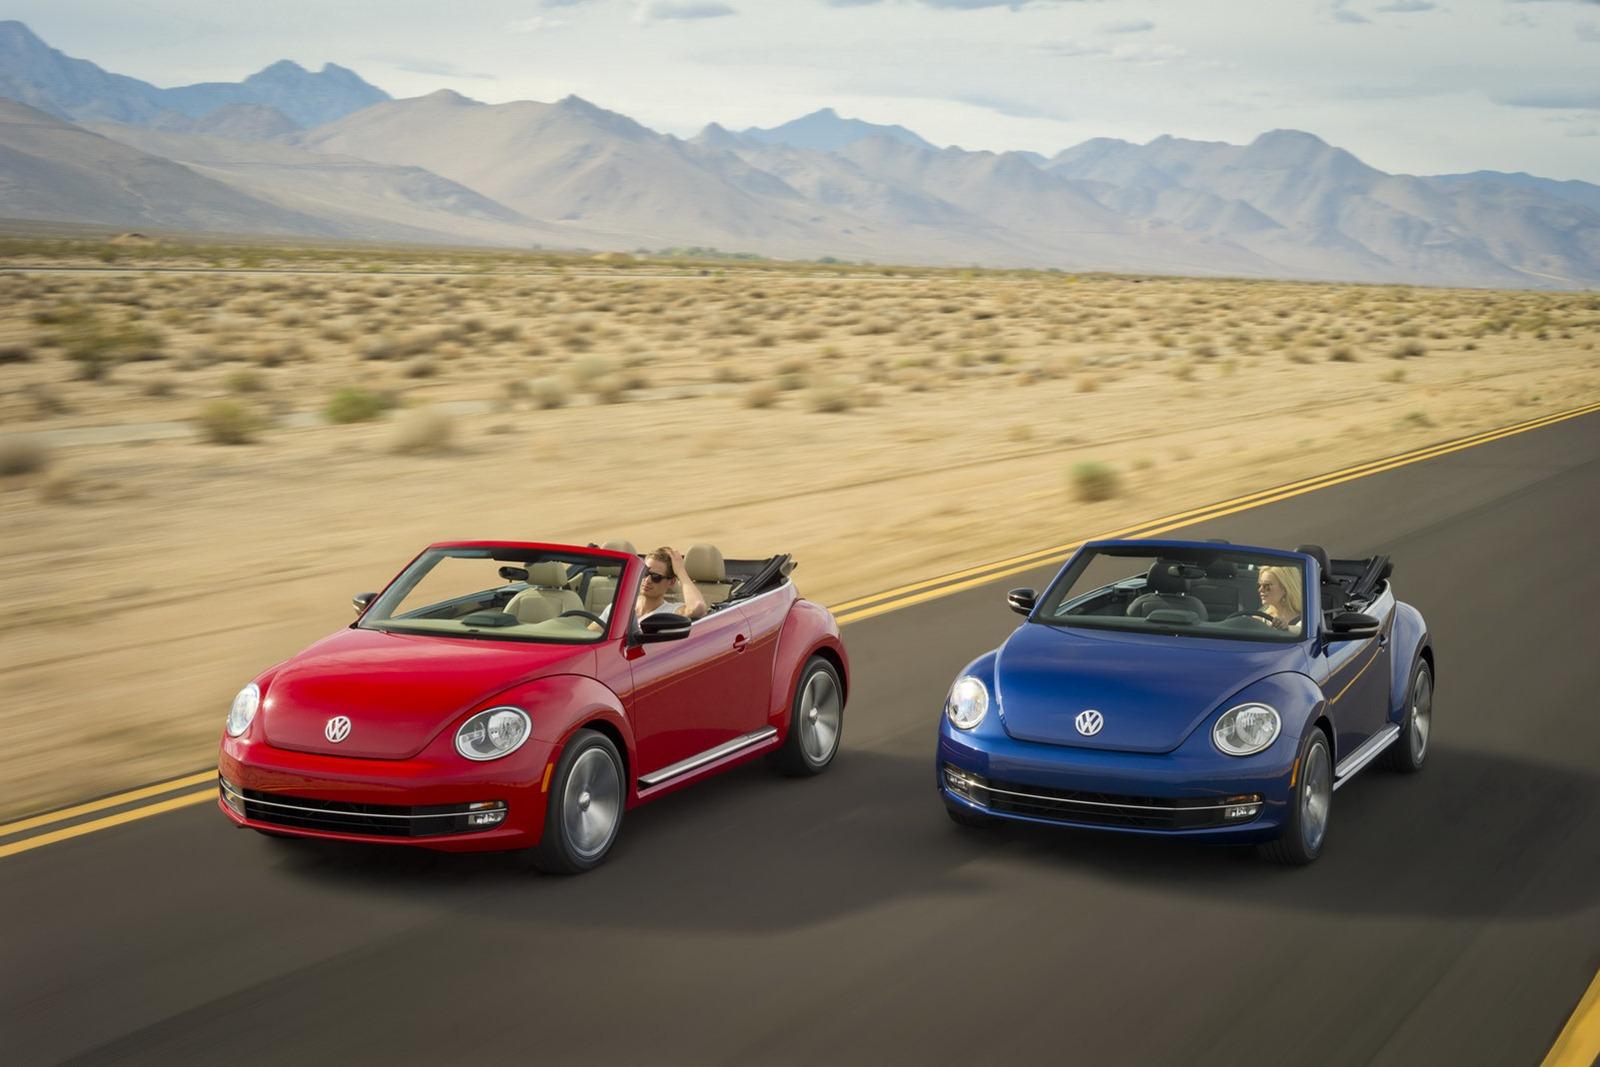 EU4 KAT VW New Beetle //Cabriolet 1.8 20v Turbo 110//132KW AWV BNU AWU AWP BKF 200